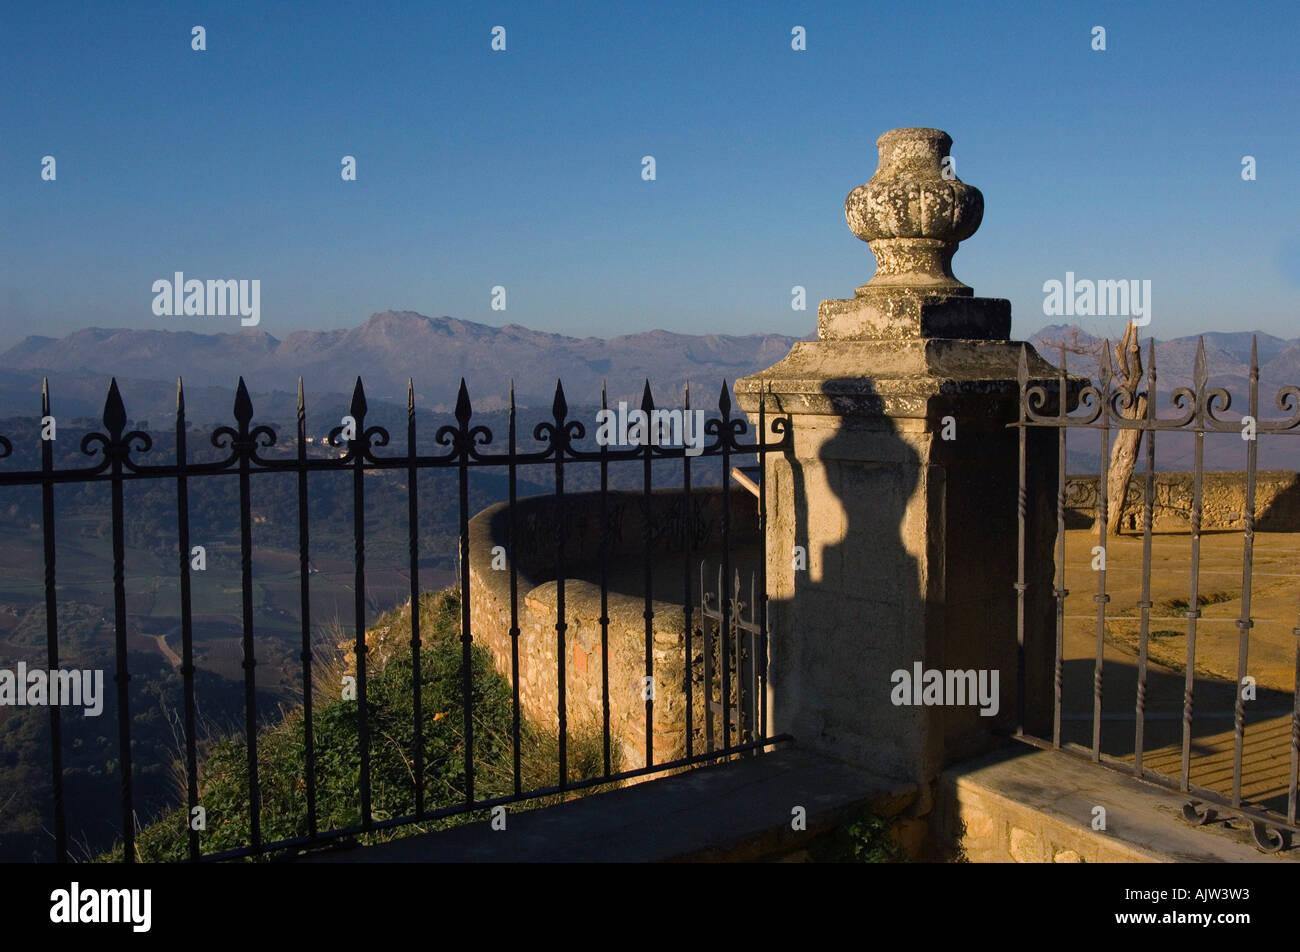 Serrania de Ronda / Ronda  - Stock Image